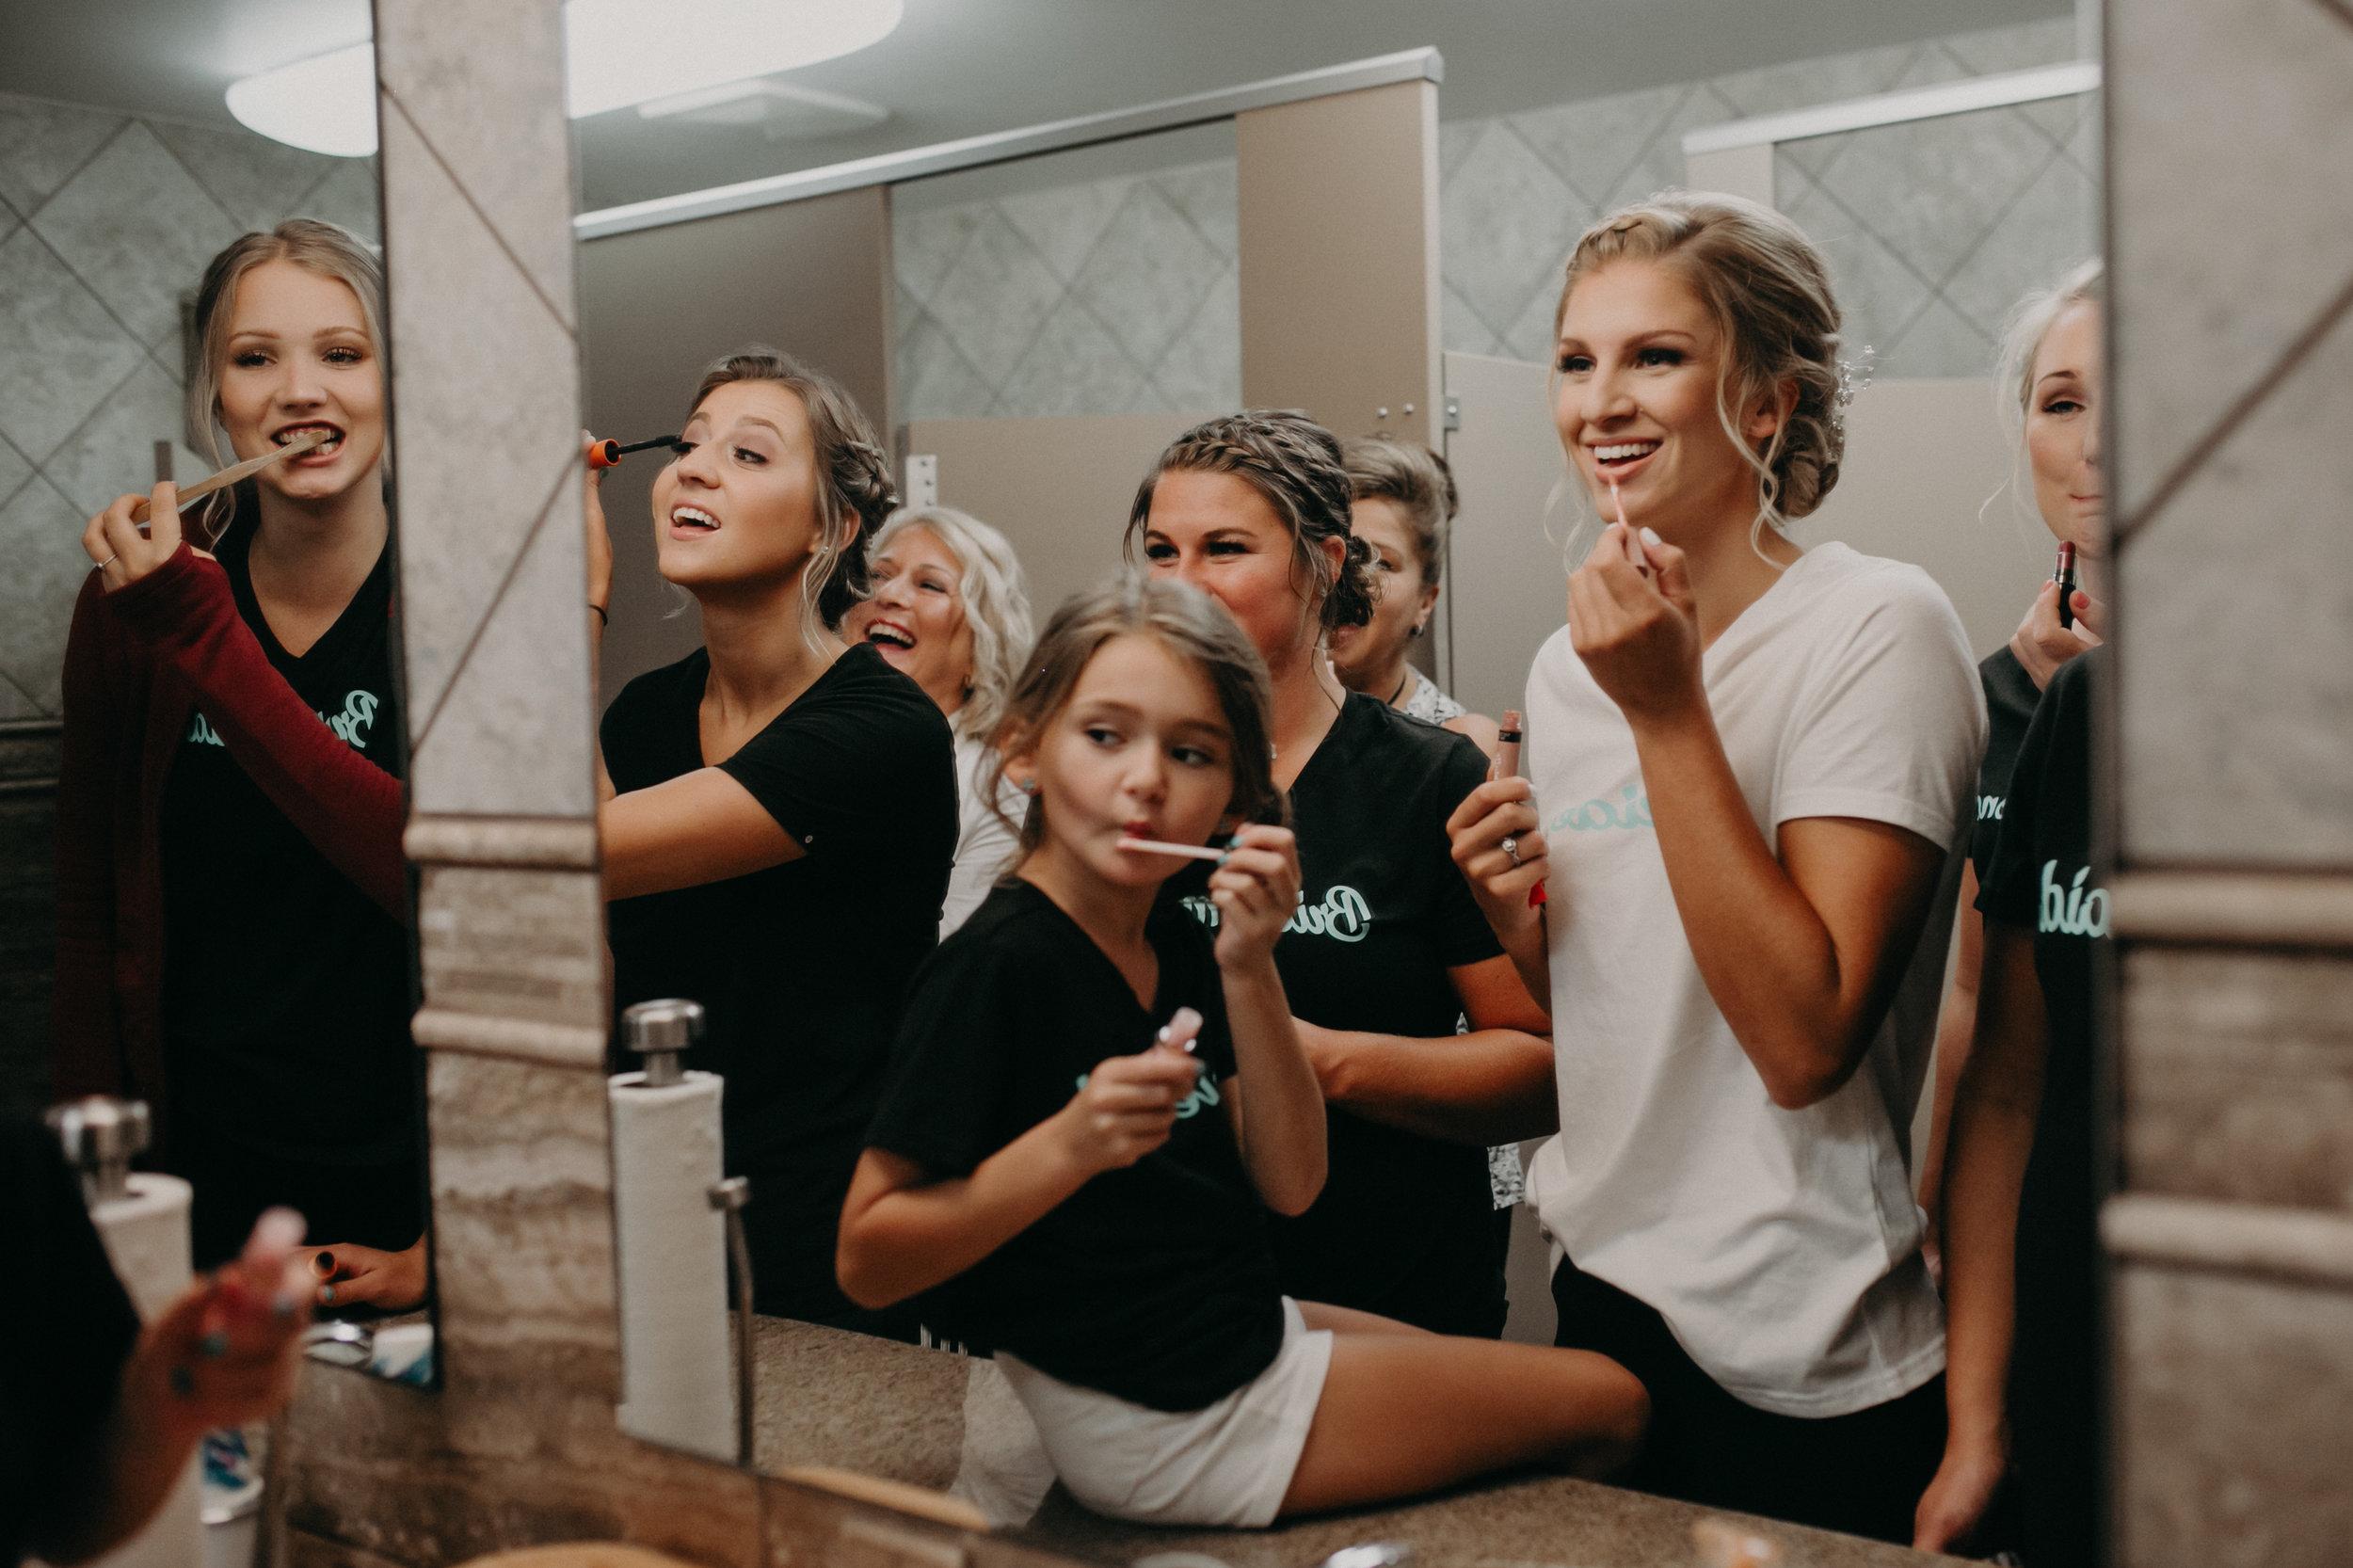 bridesmaids-wedding-christ-lutheran-church-bathroom-marshfield-wi